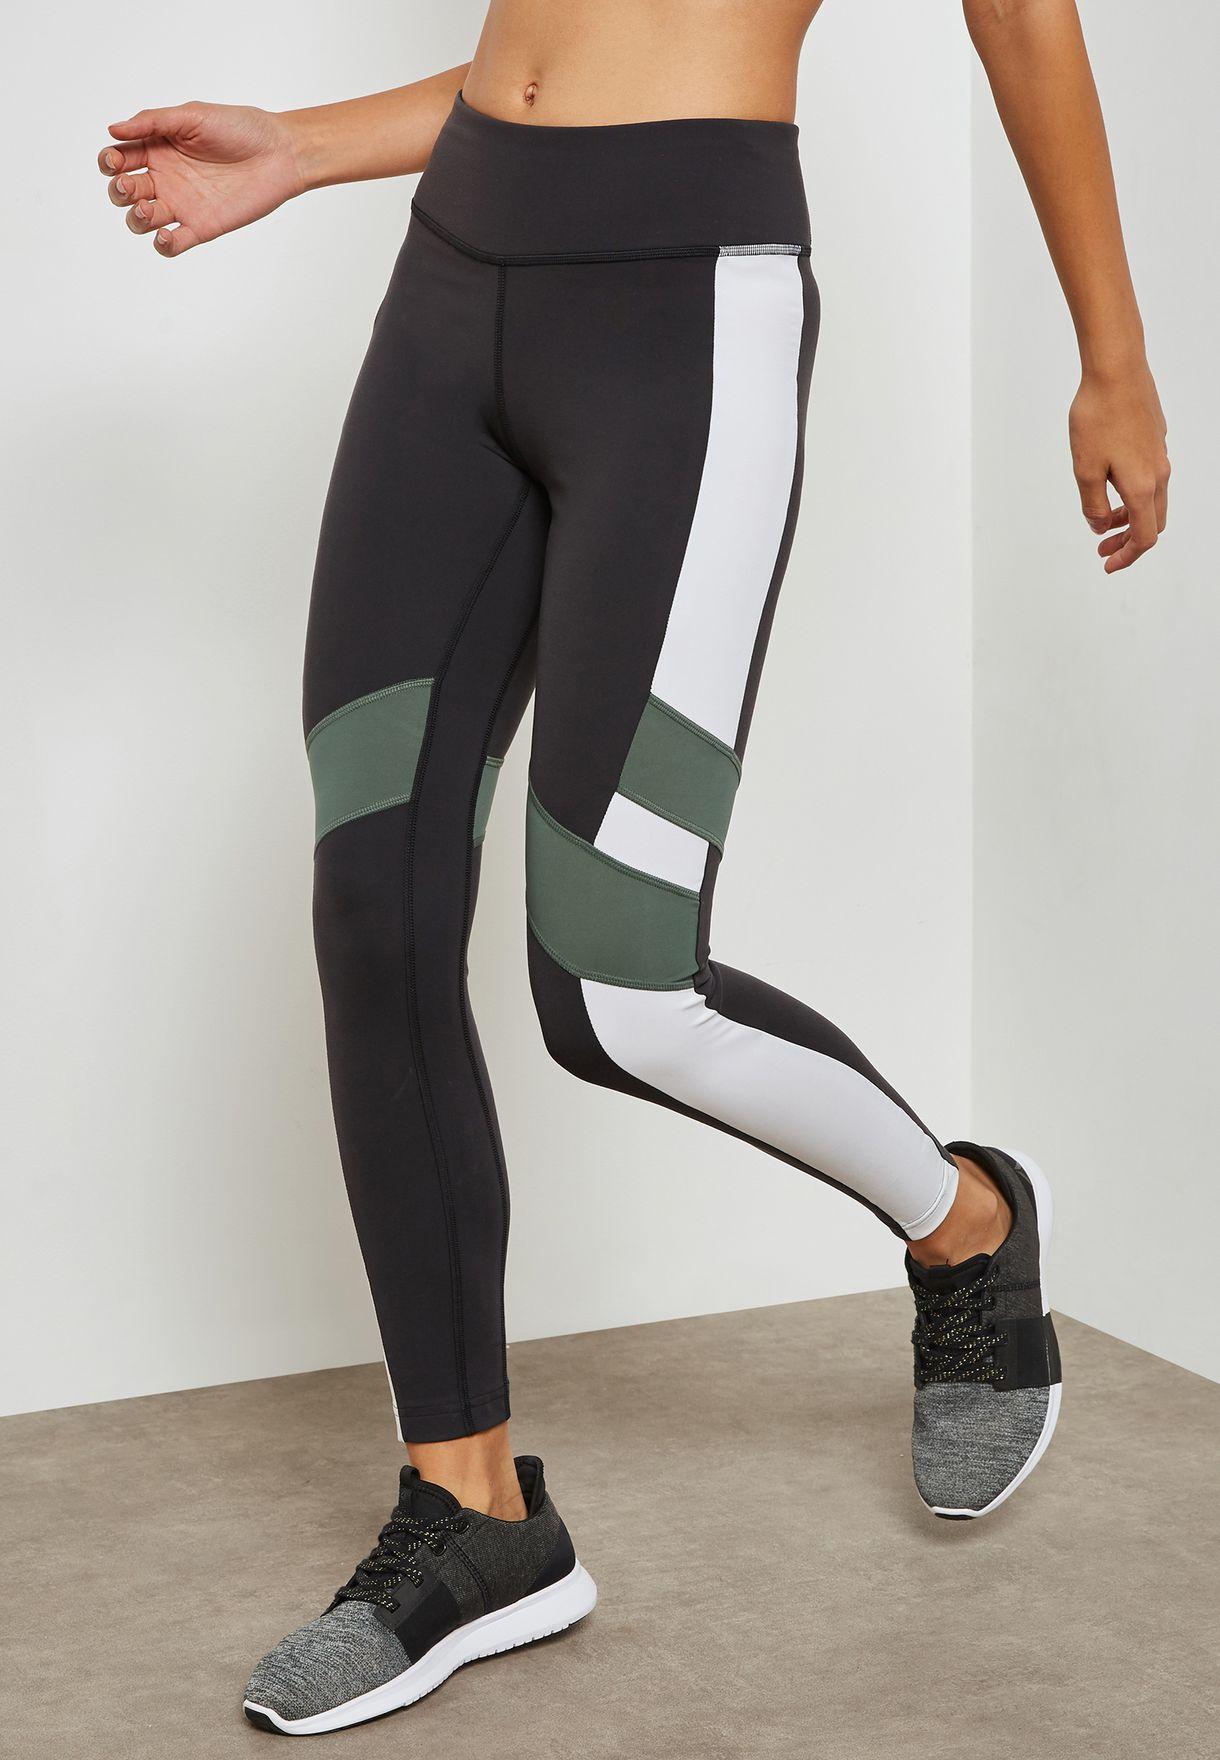 7090cb77f2dc9 Shop Reebok multicolor Lux Colour Block Leggings D94129 for Women in ...